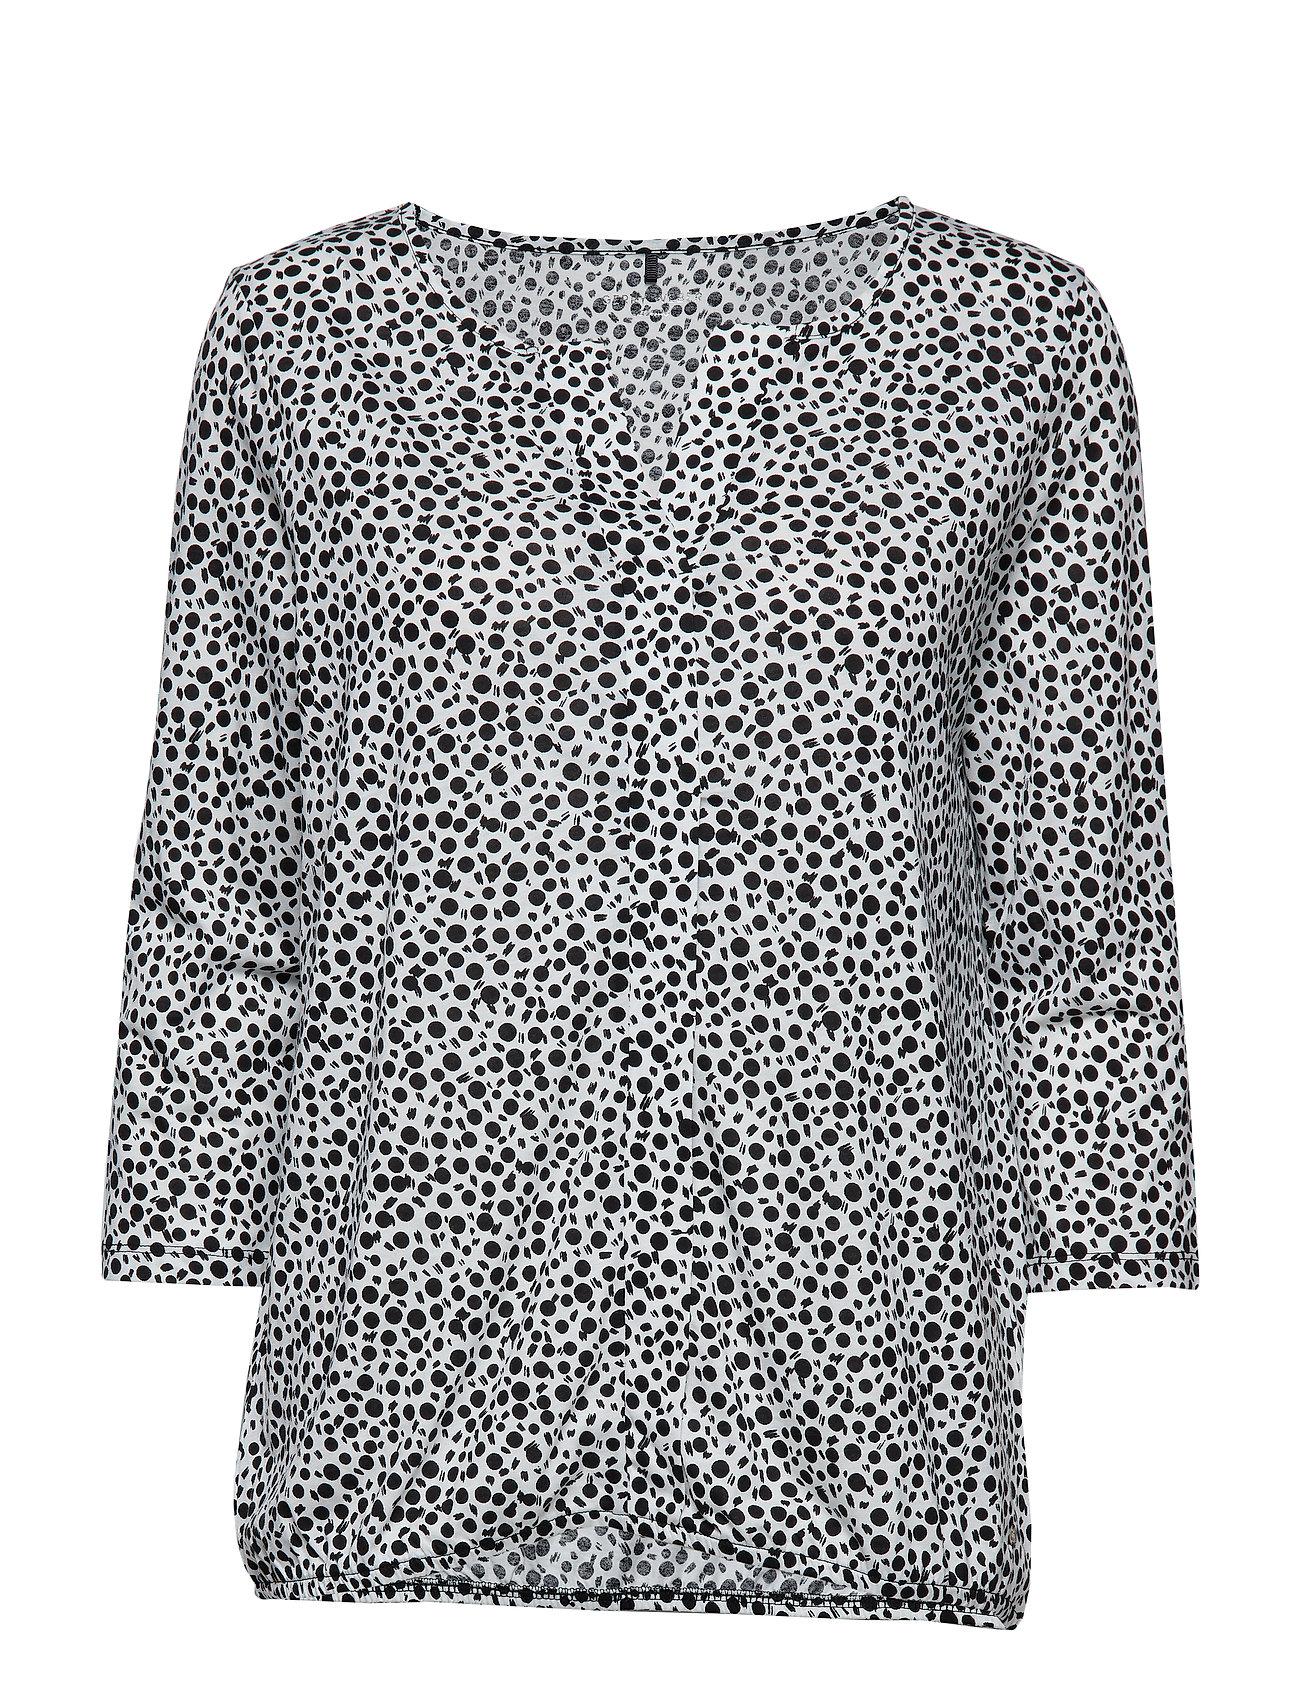 Image of T-Shirt 3/4-Sleeve R Langærmet T-shirt Hvid GERRY WEBER EDITION (3090827623)